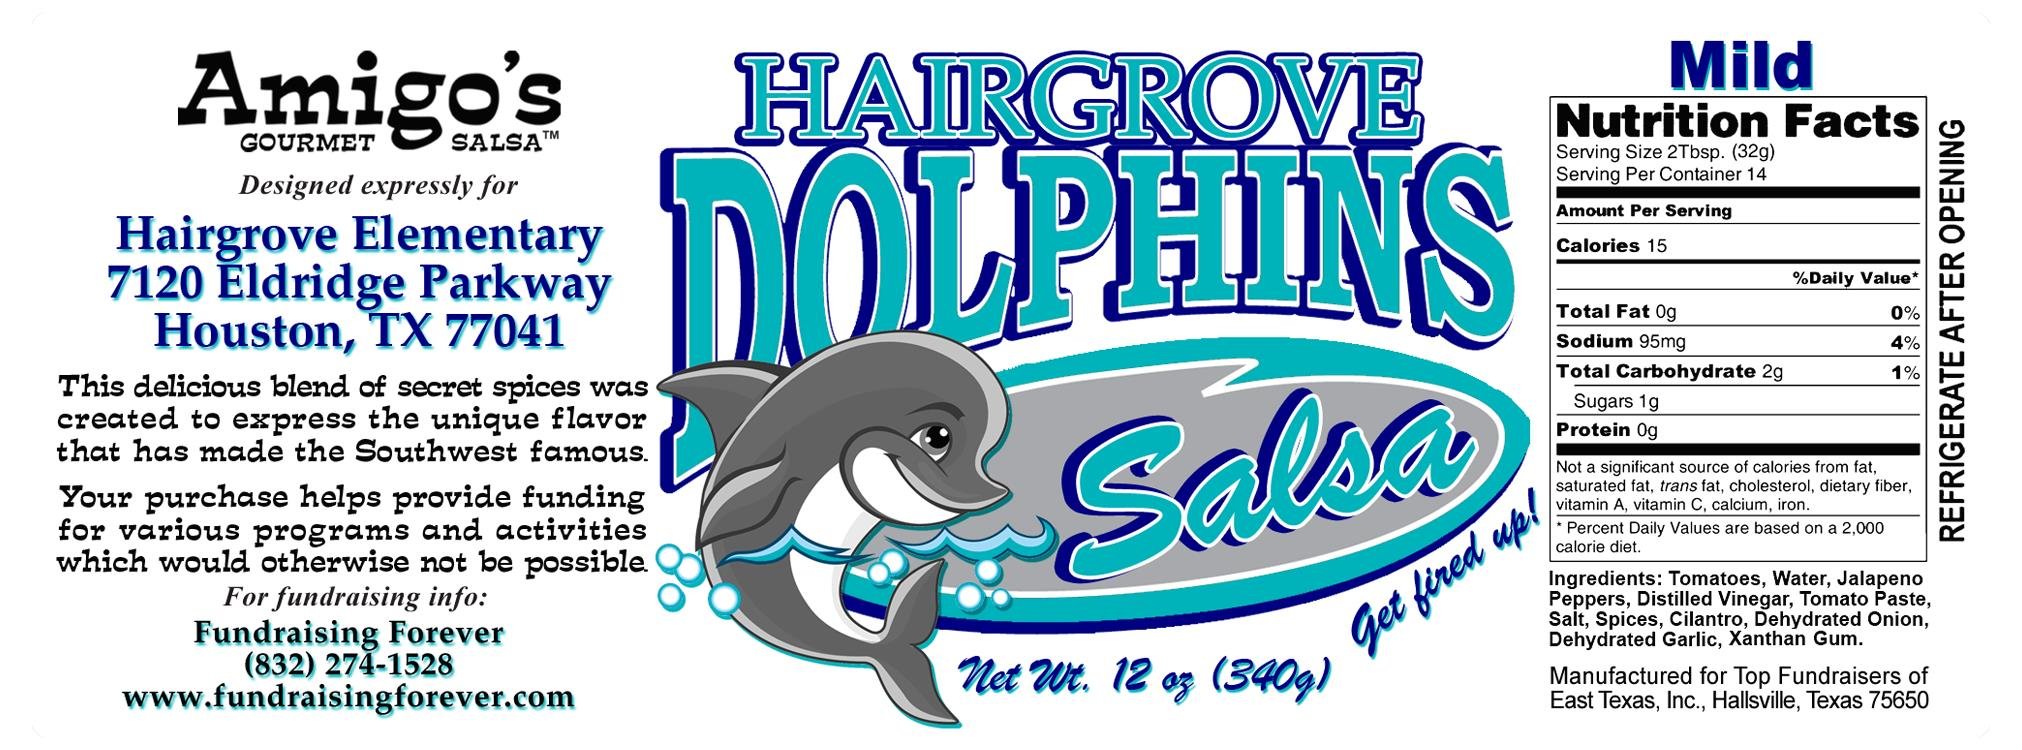 Hairgrove Elementary Dolphins Jar Label MILD.jpg